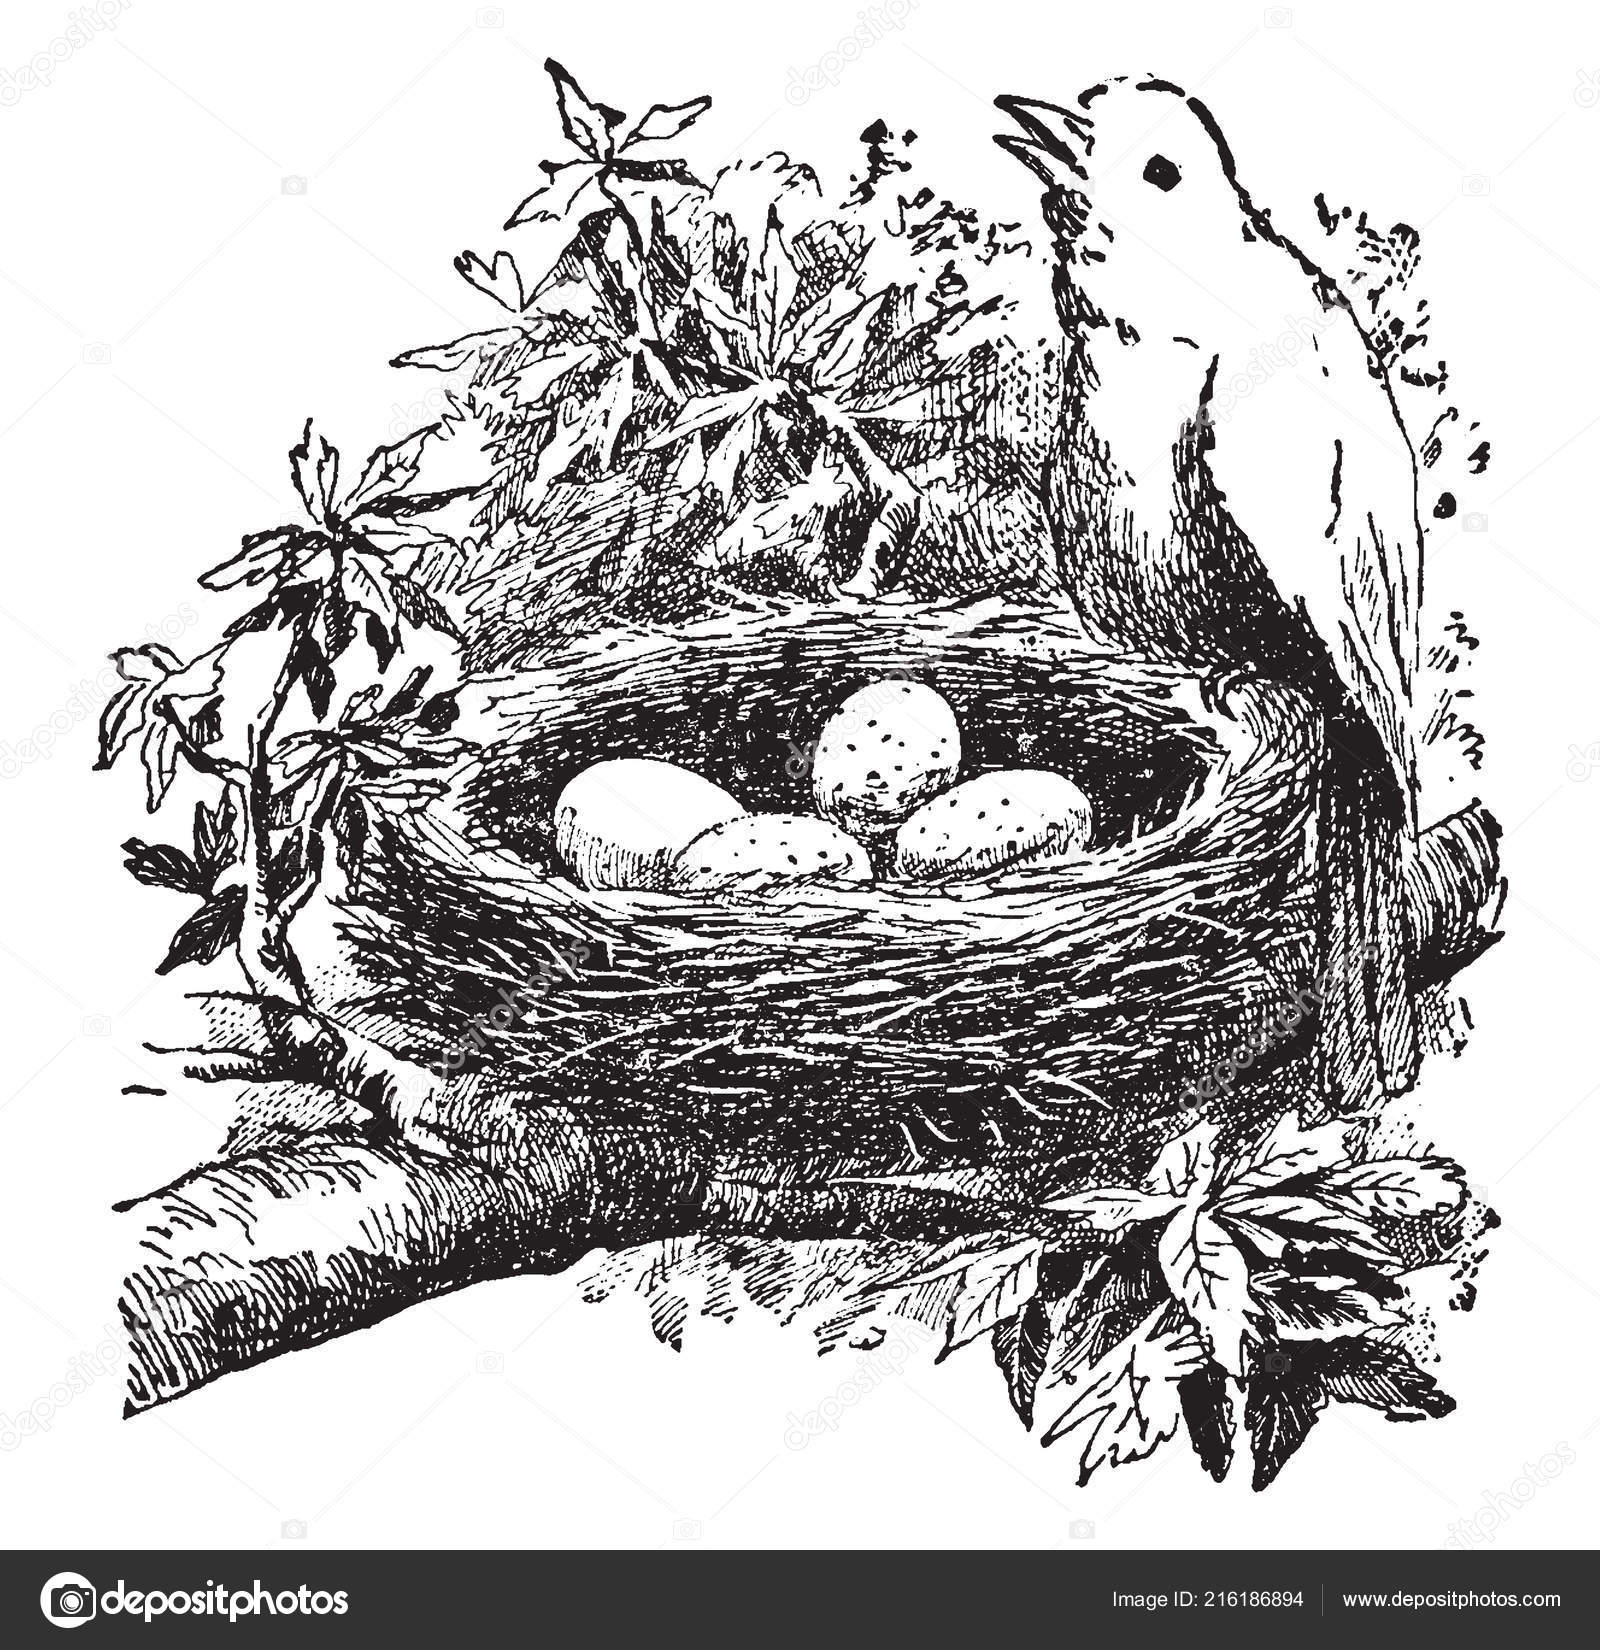 Antique Bird Nest Illustration - The Graphics Fairy